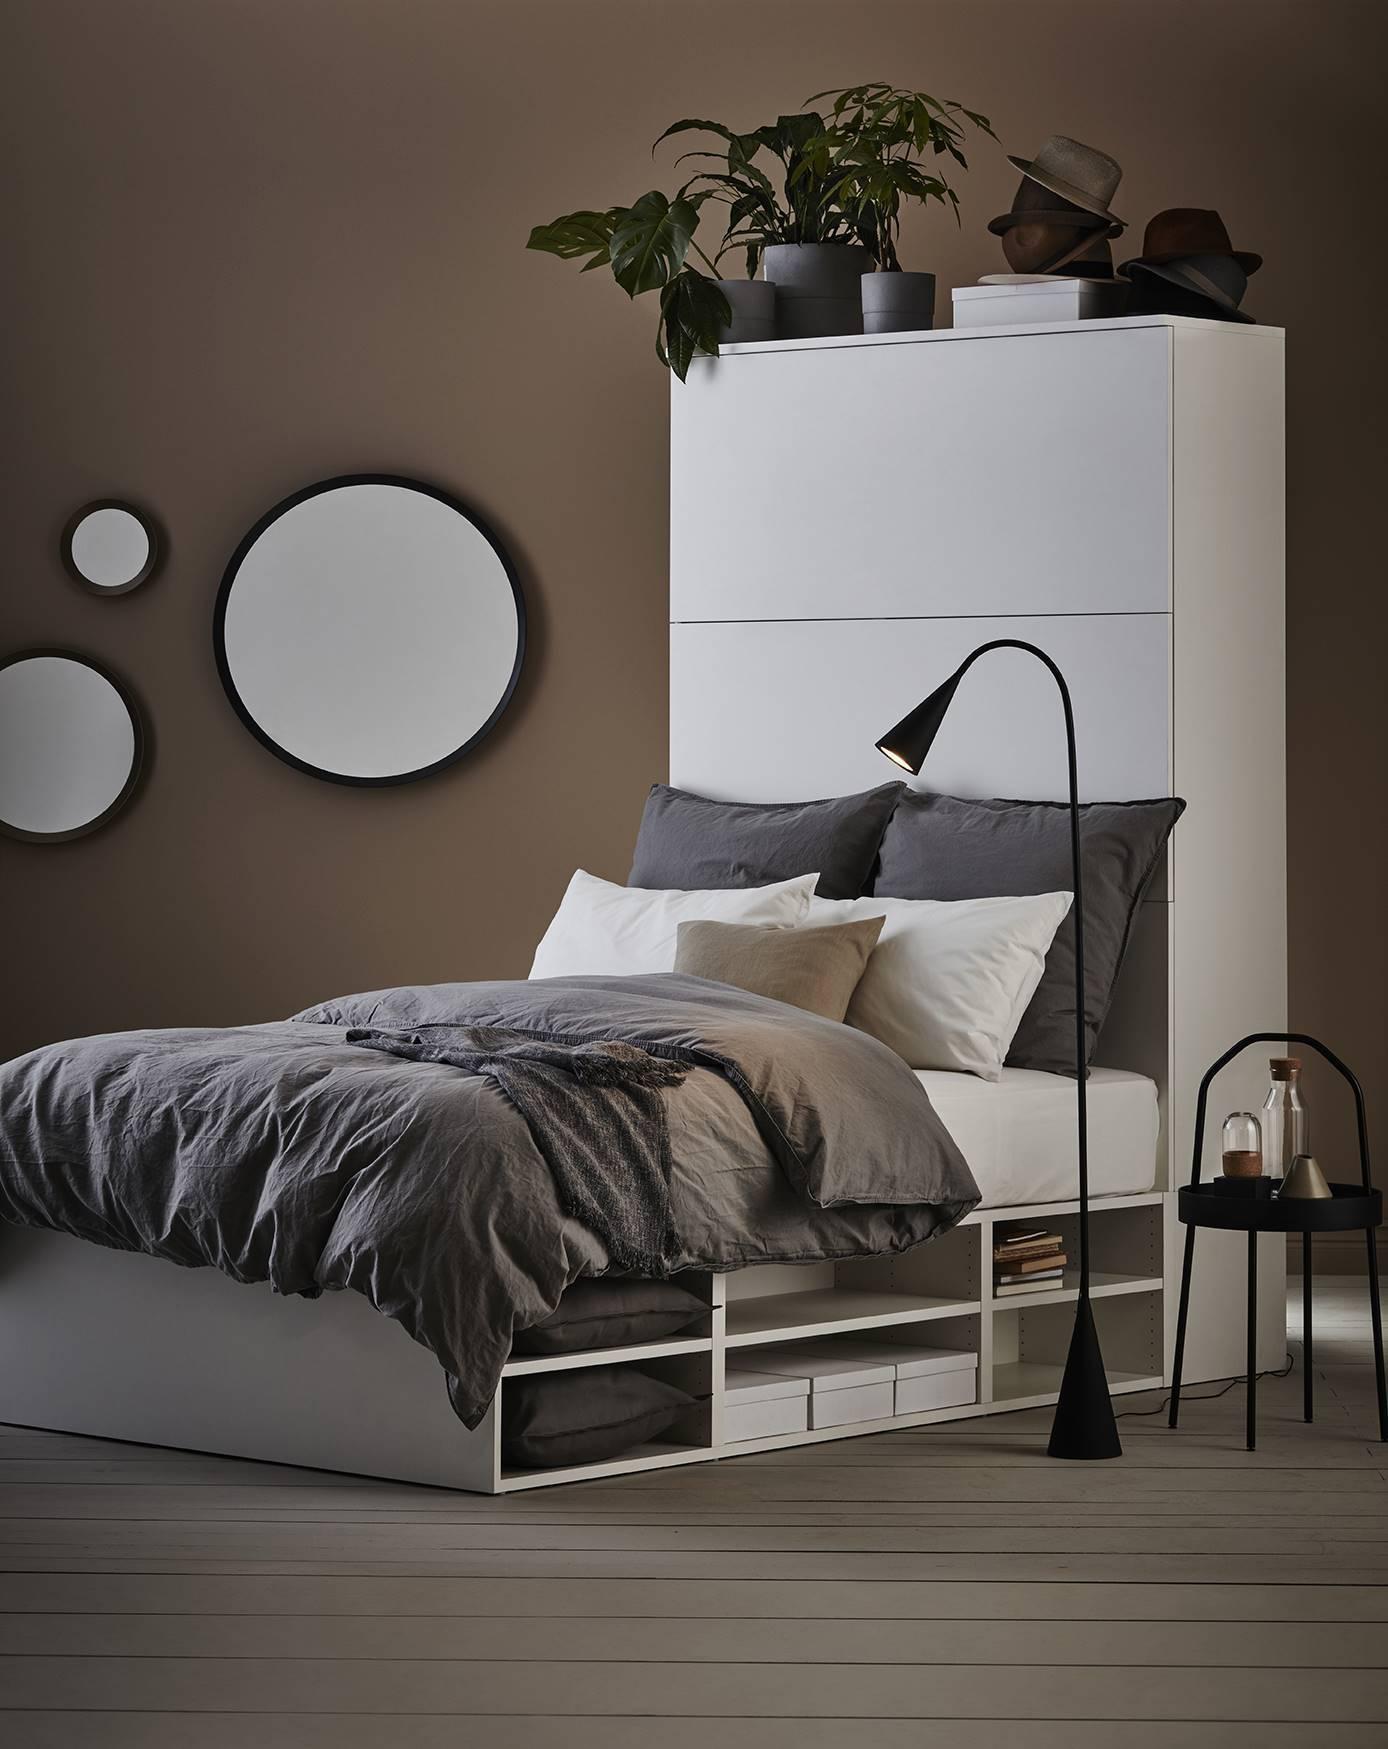 The Nordroom - IKEA Catalog 2020 49.jpg